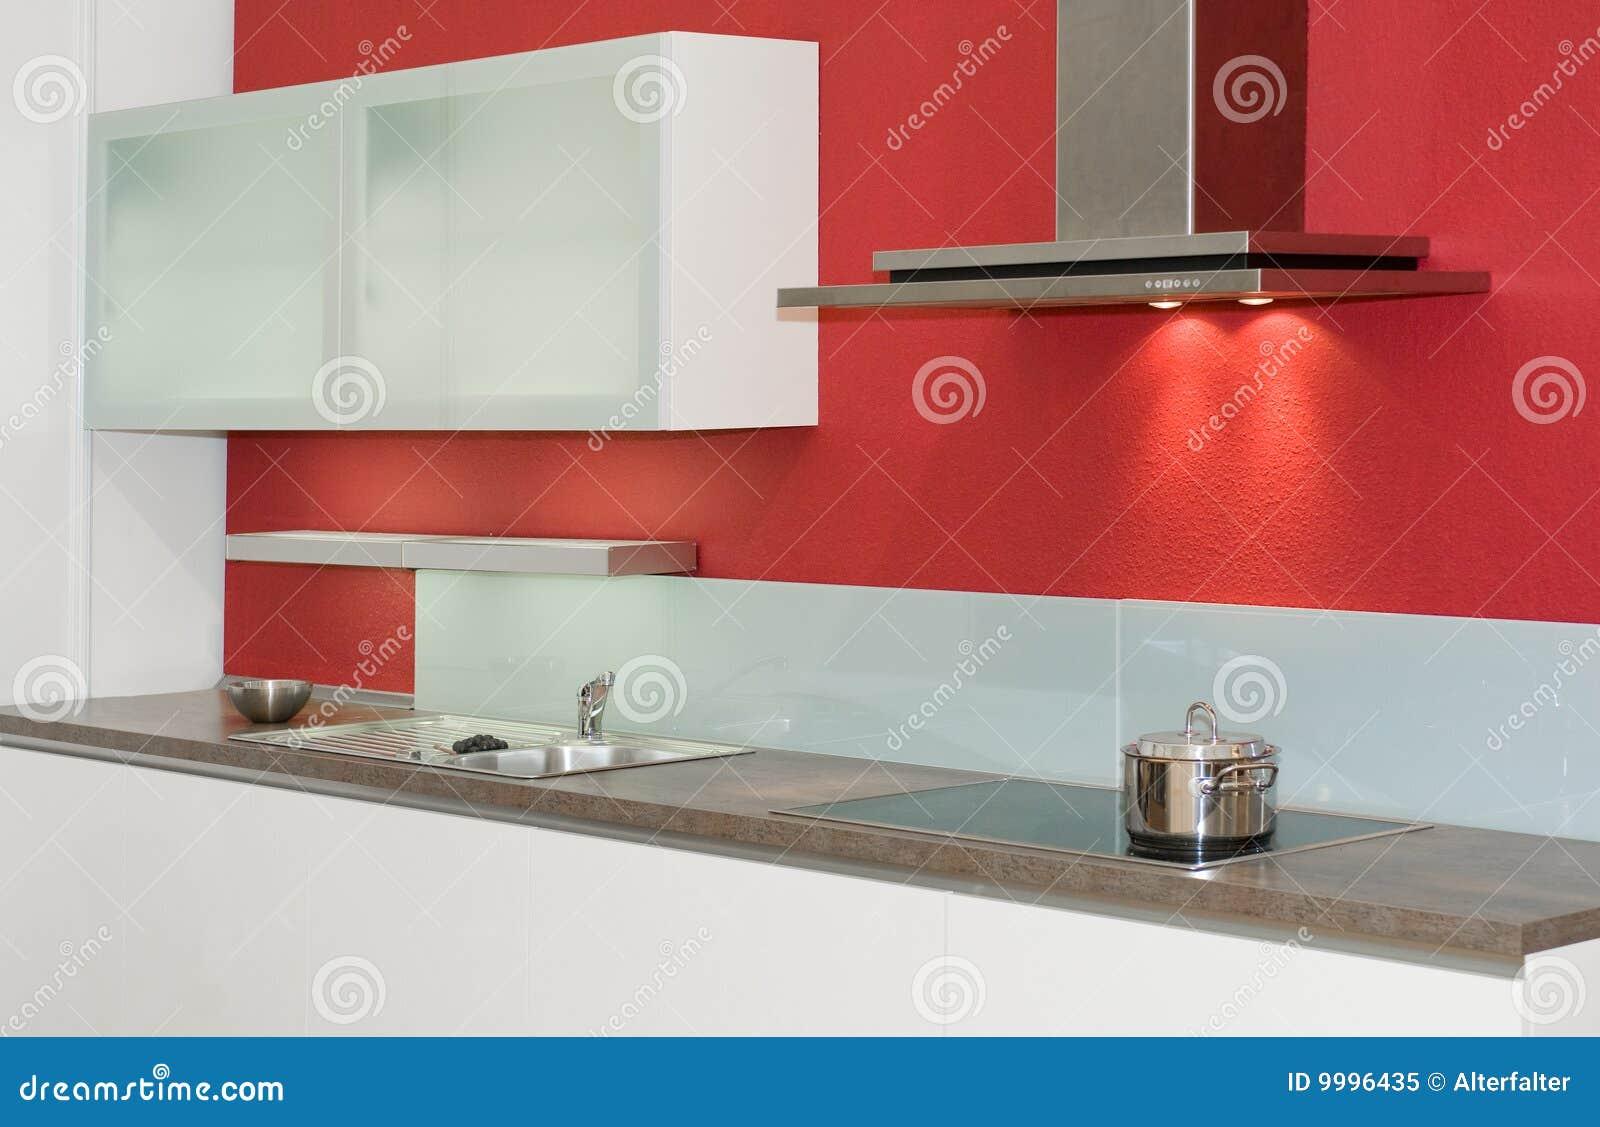 Good cucina rossa e bianca cucina moderna rossa foto stock u cucina moderna rossa with cucine - Cucina rossa e bianca ...